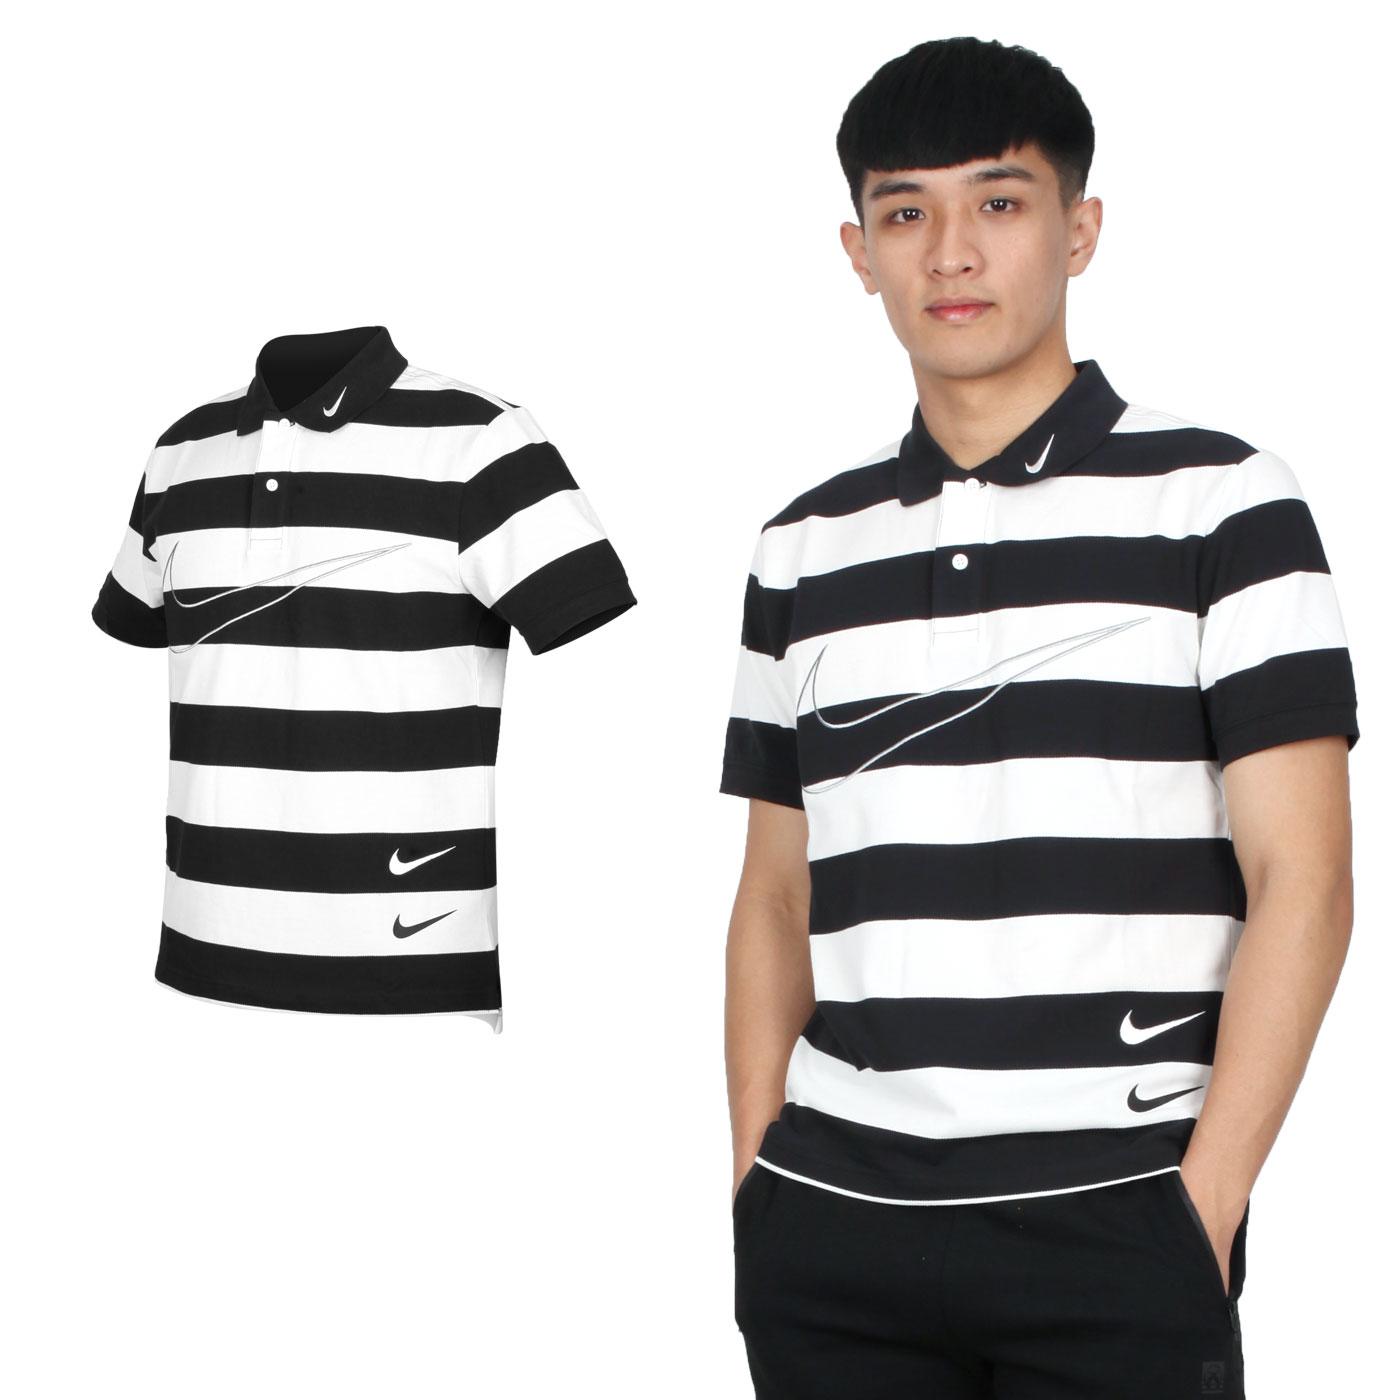 NIKE 男款短袖POLO衫 CJ4910-011